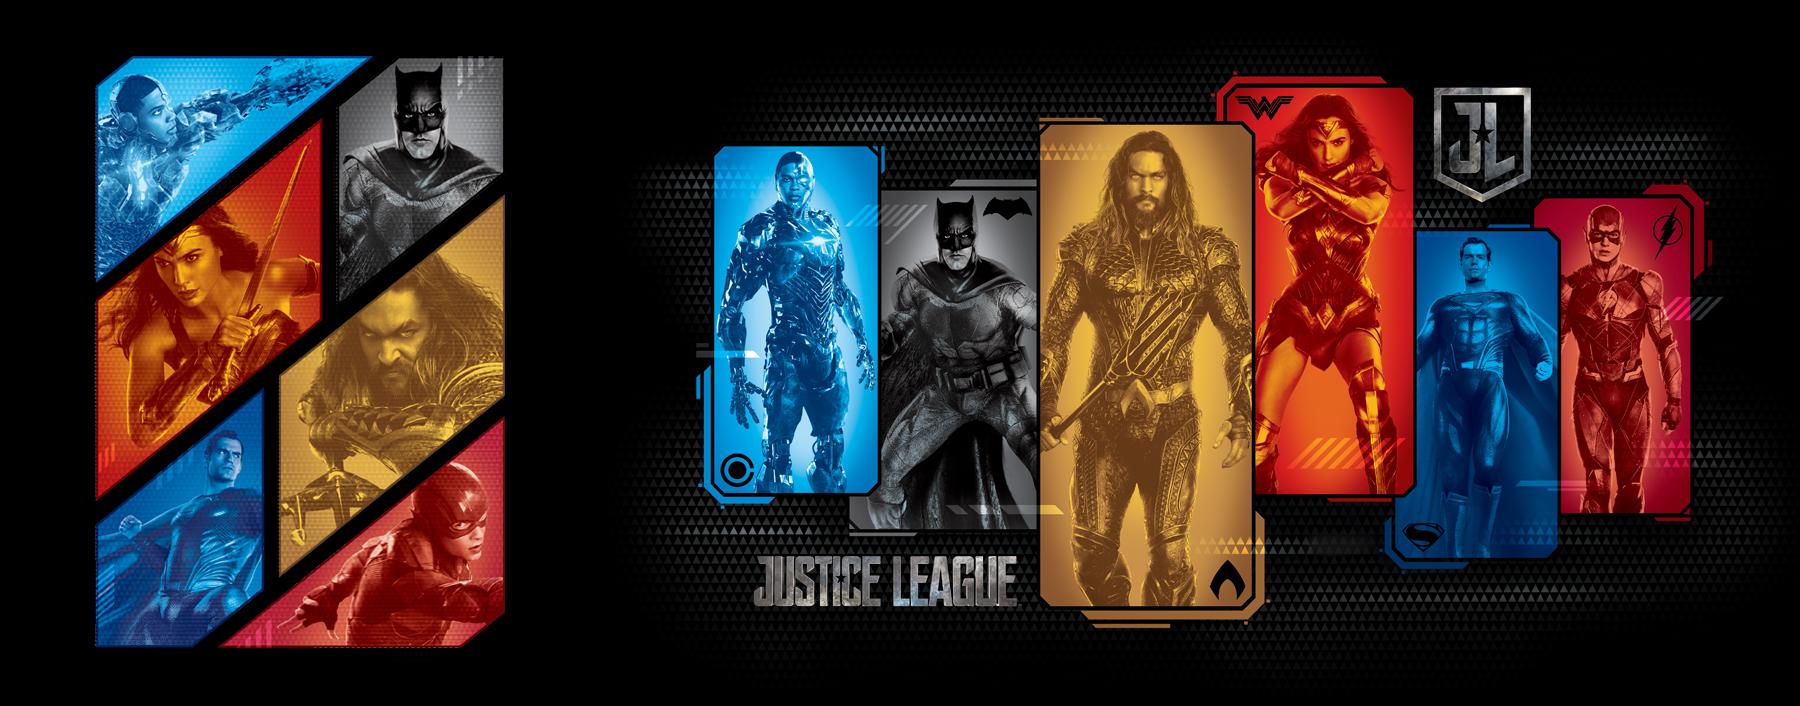 Justice League Style Guide Design - Panel 5